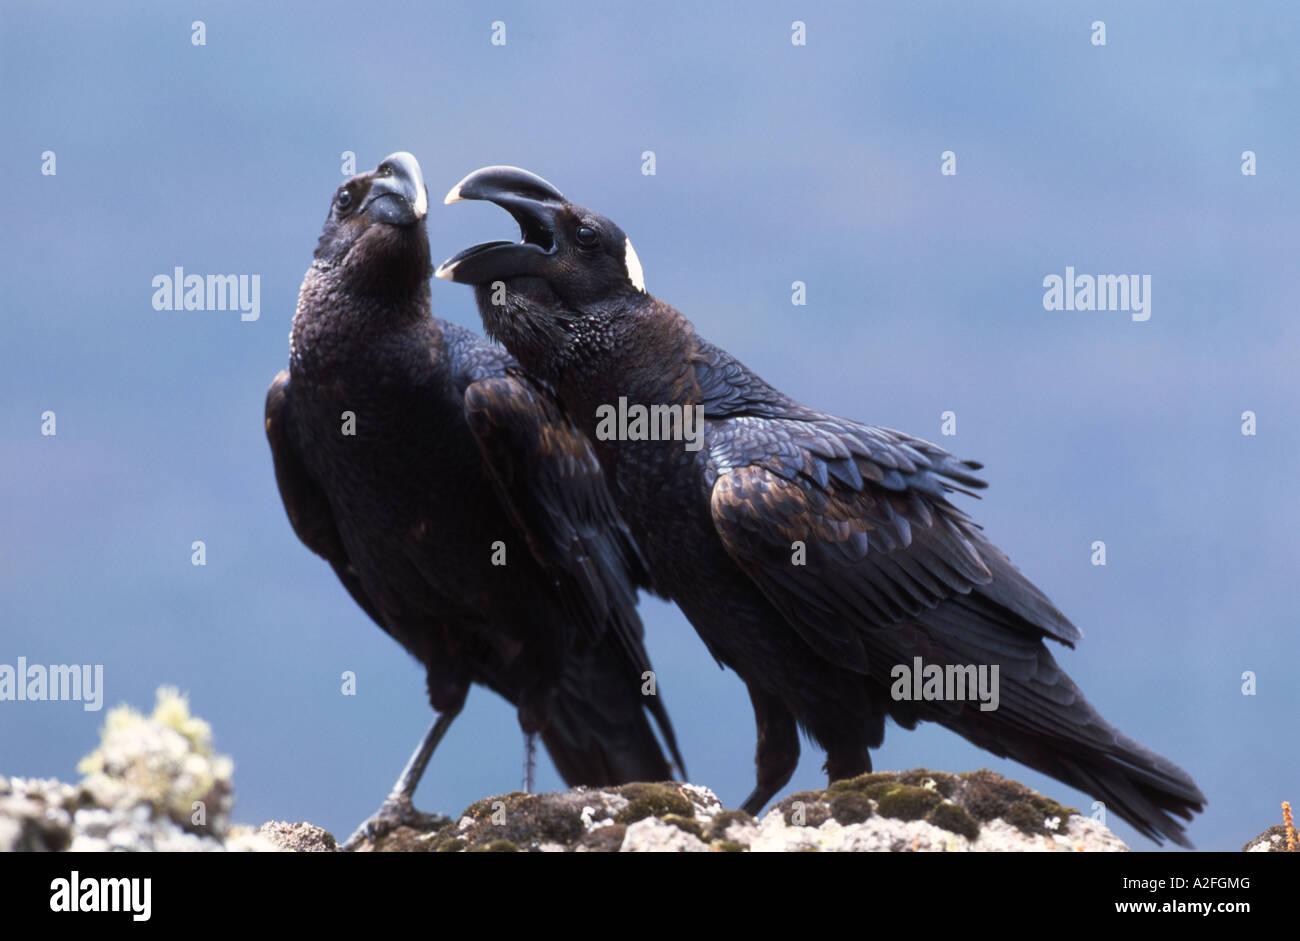 Pair of Thick-billed Raven (Corvus crassirostris) Simien Mountain National Park, Ethiopia - Stock Image